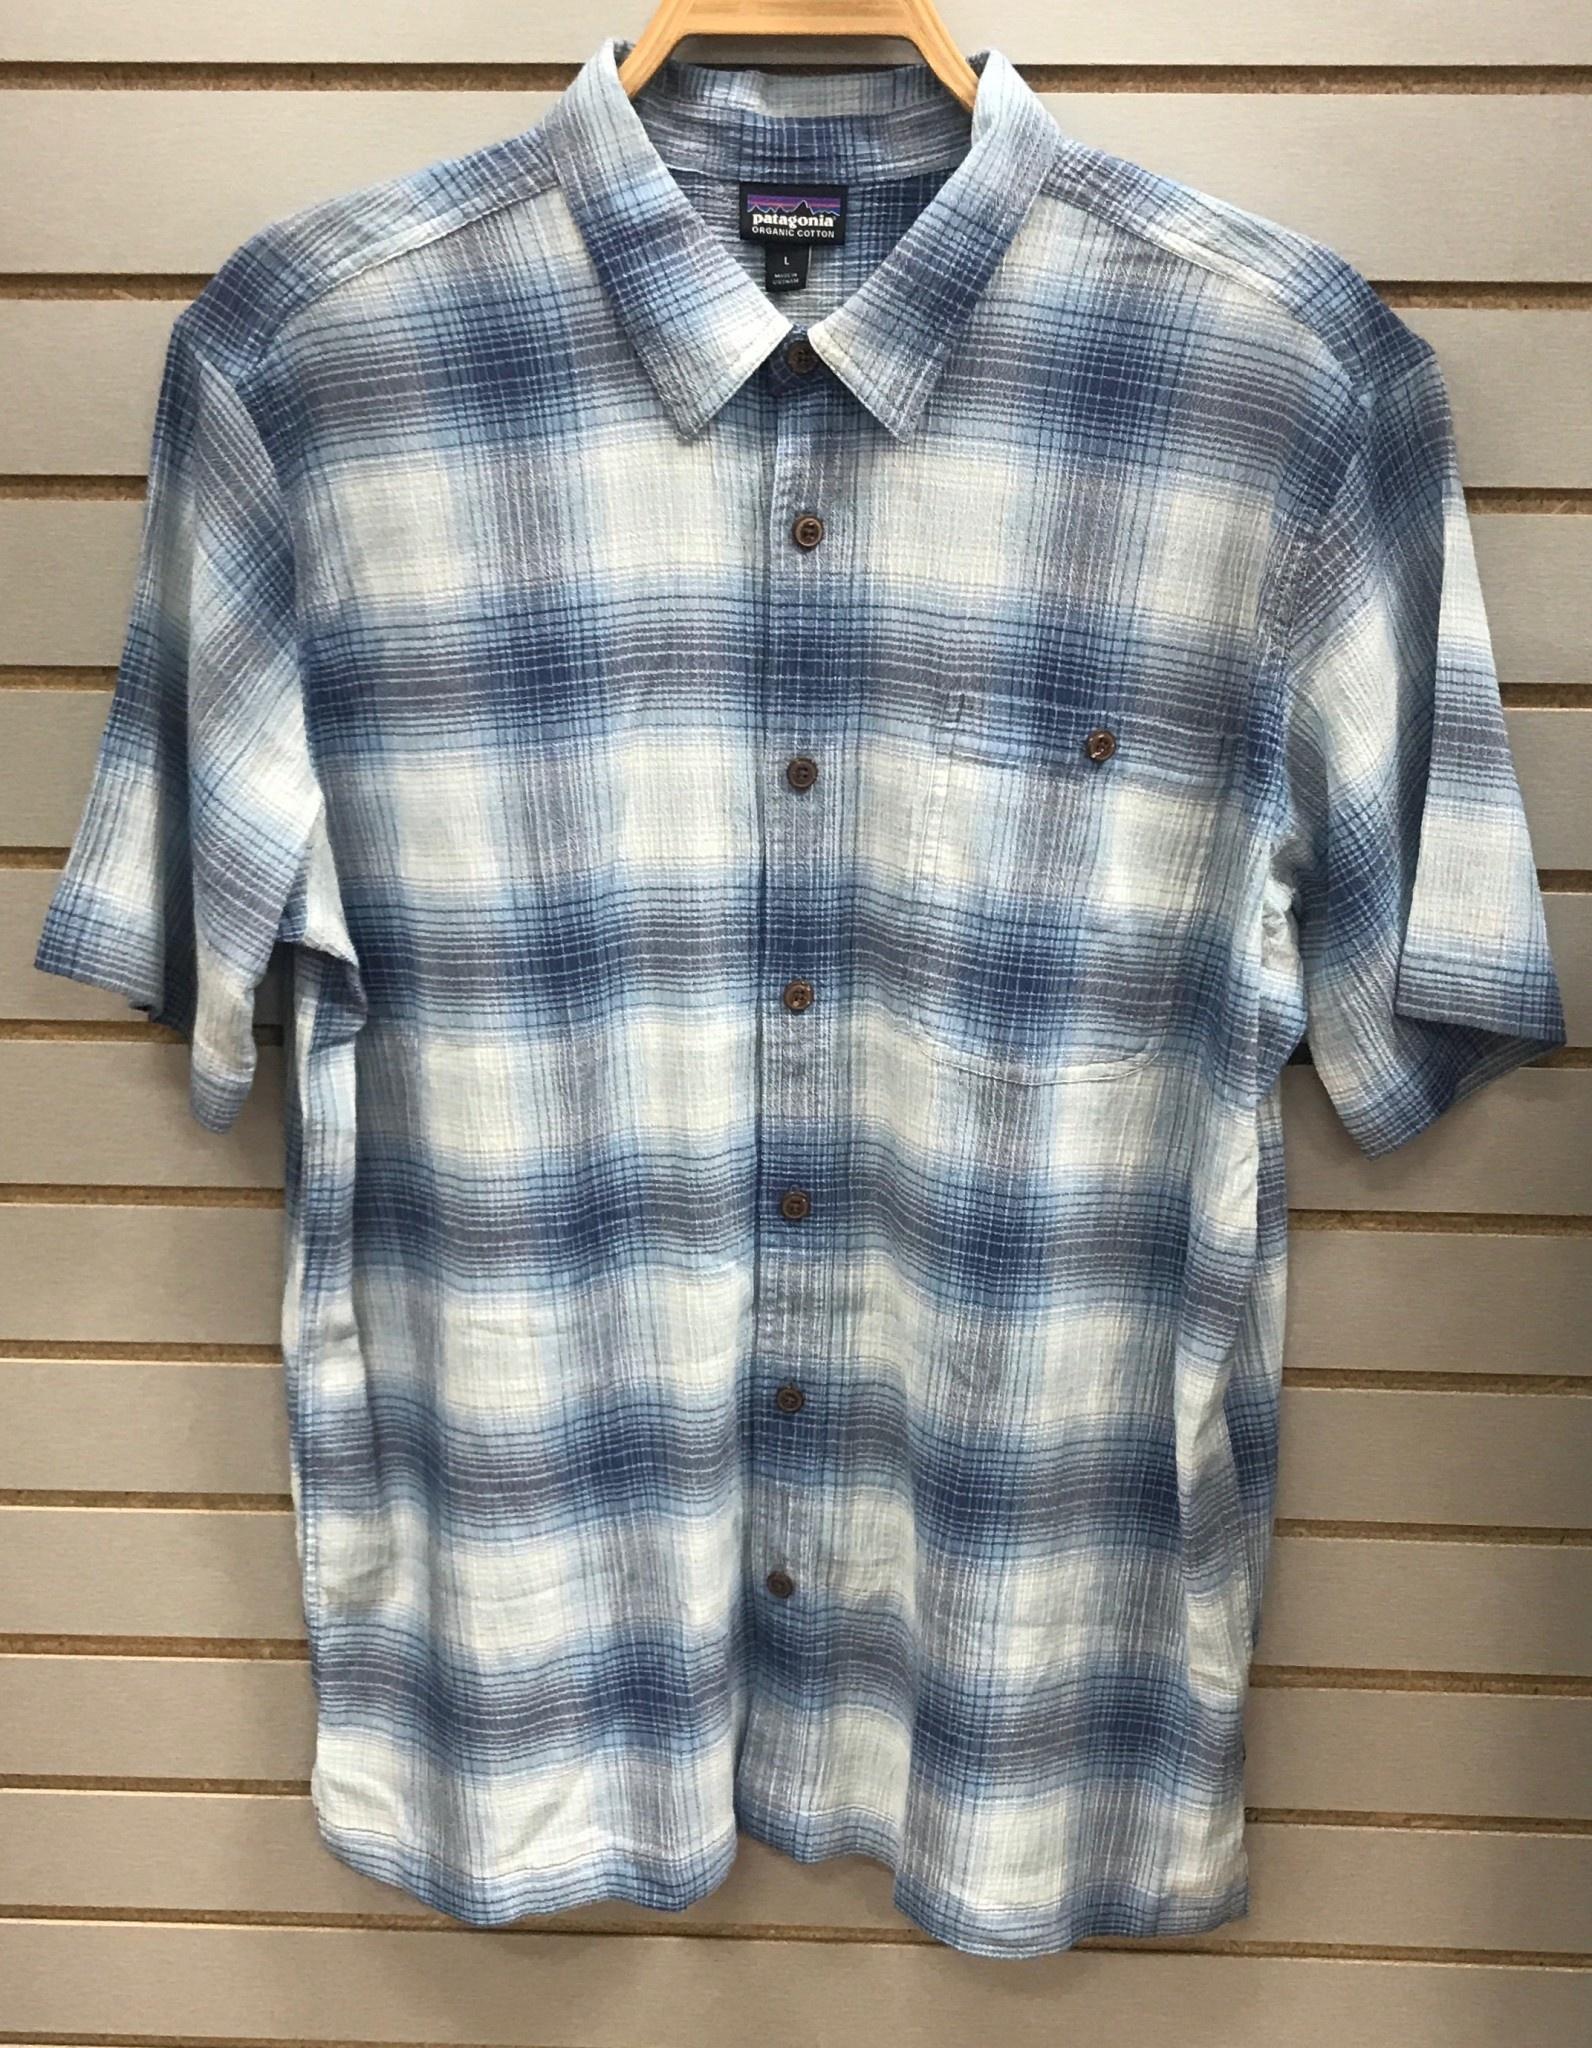 Patagonia Mens A/C Shirt Railroad Blue 50% Off!!